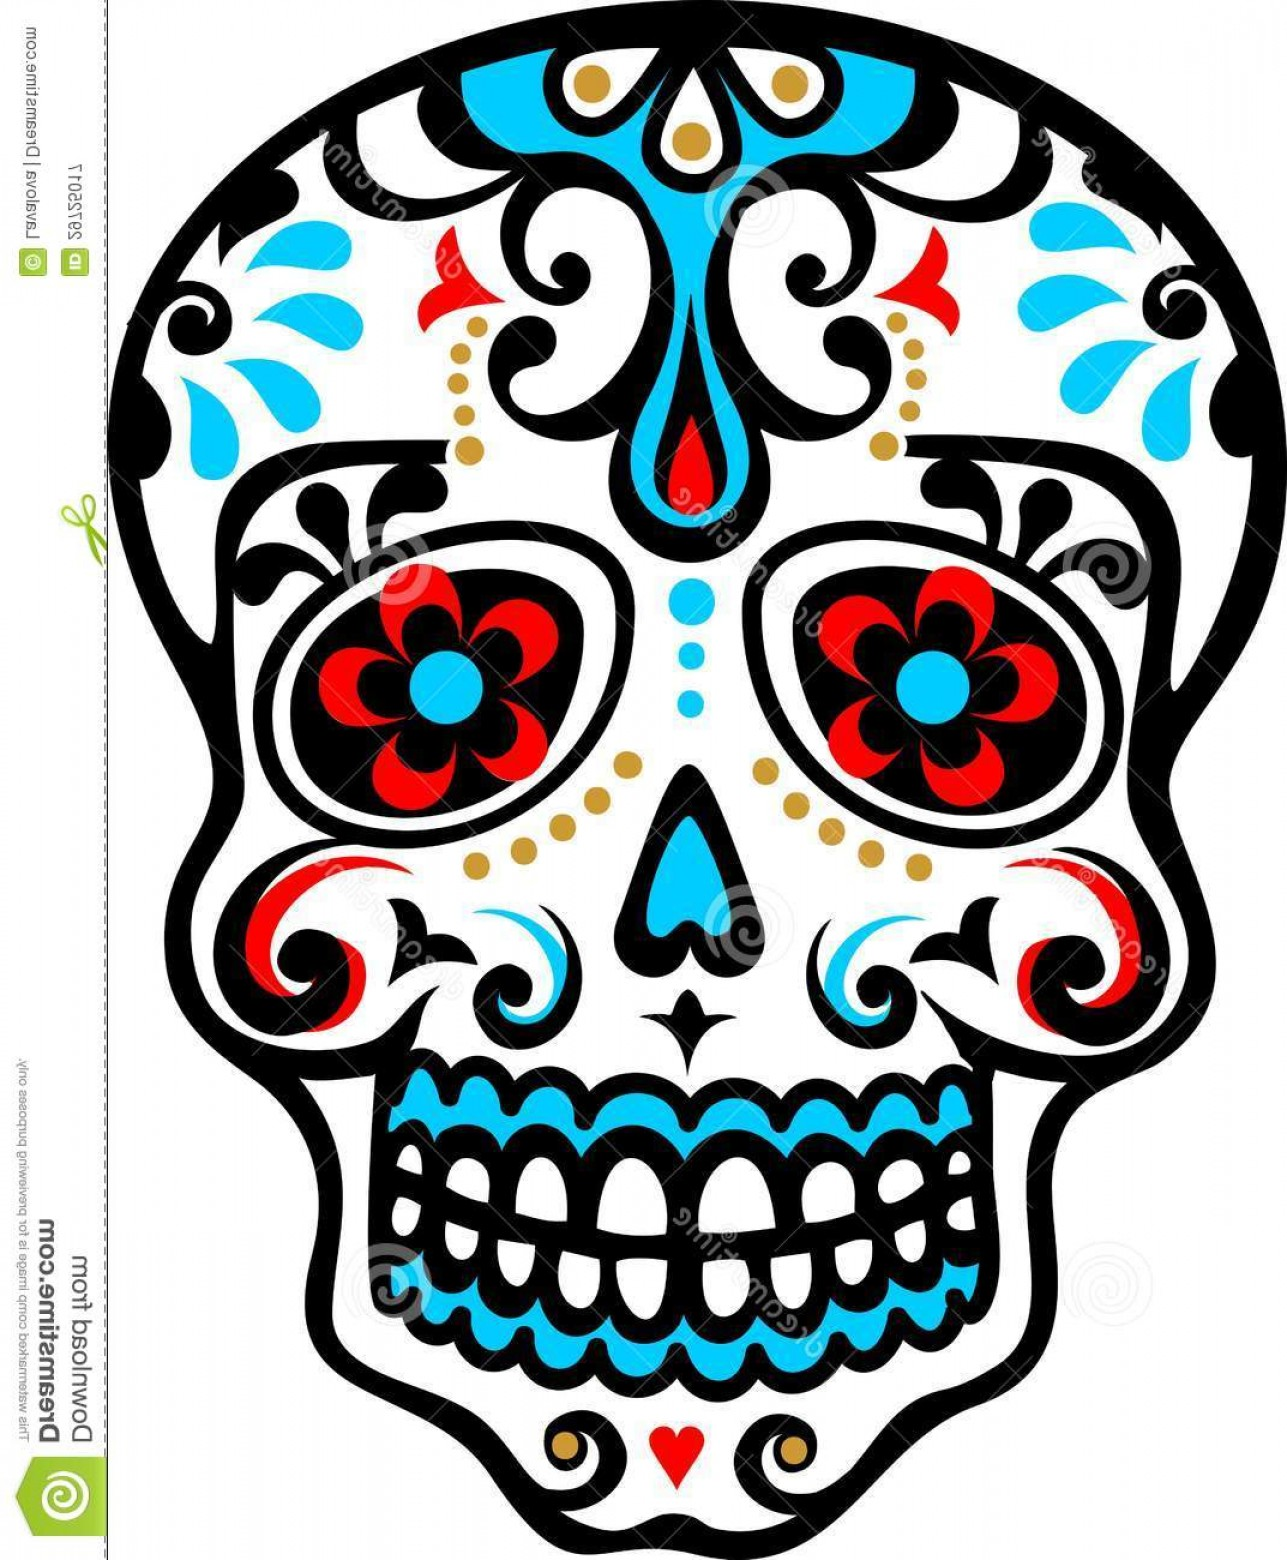 Dia de los muertos clipart free jpg library stock Royalty Free Stock Photography Mexican Skull El Dia De Los Muertos ... jpg library stock